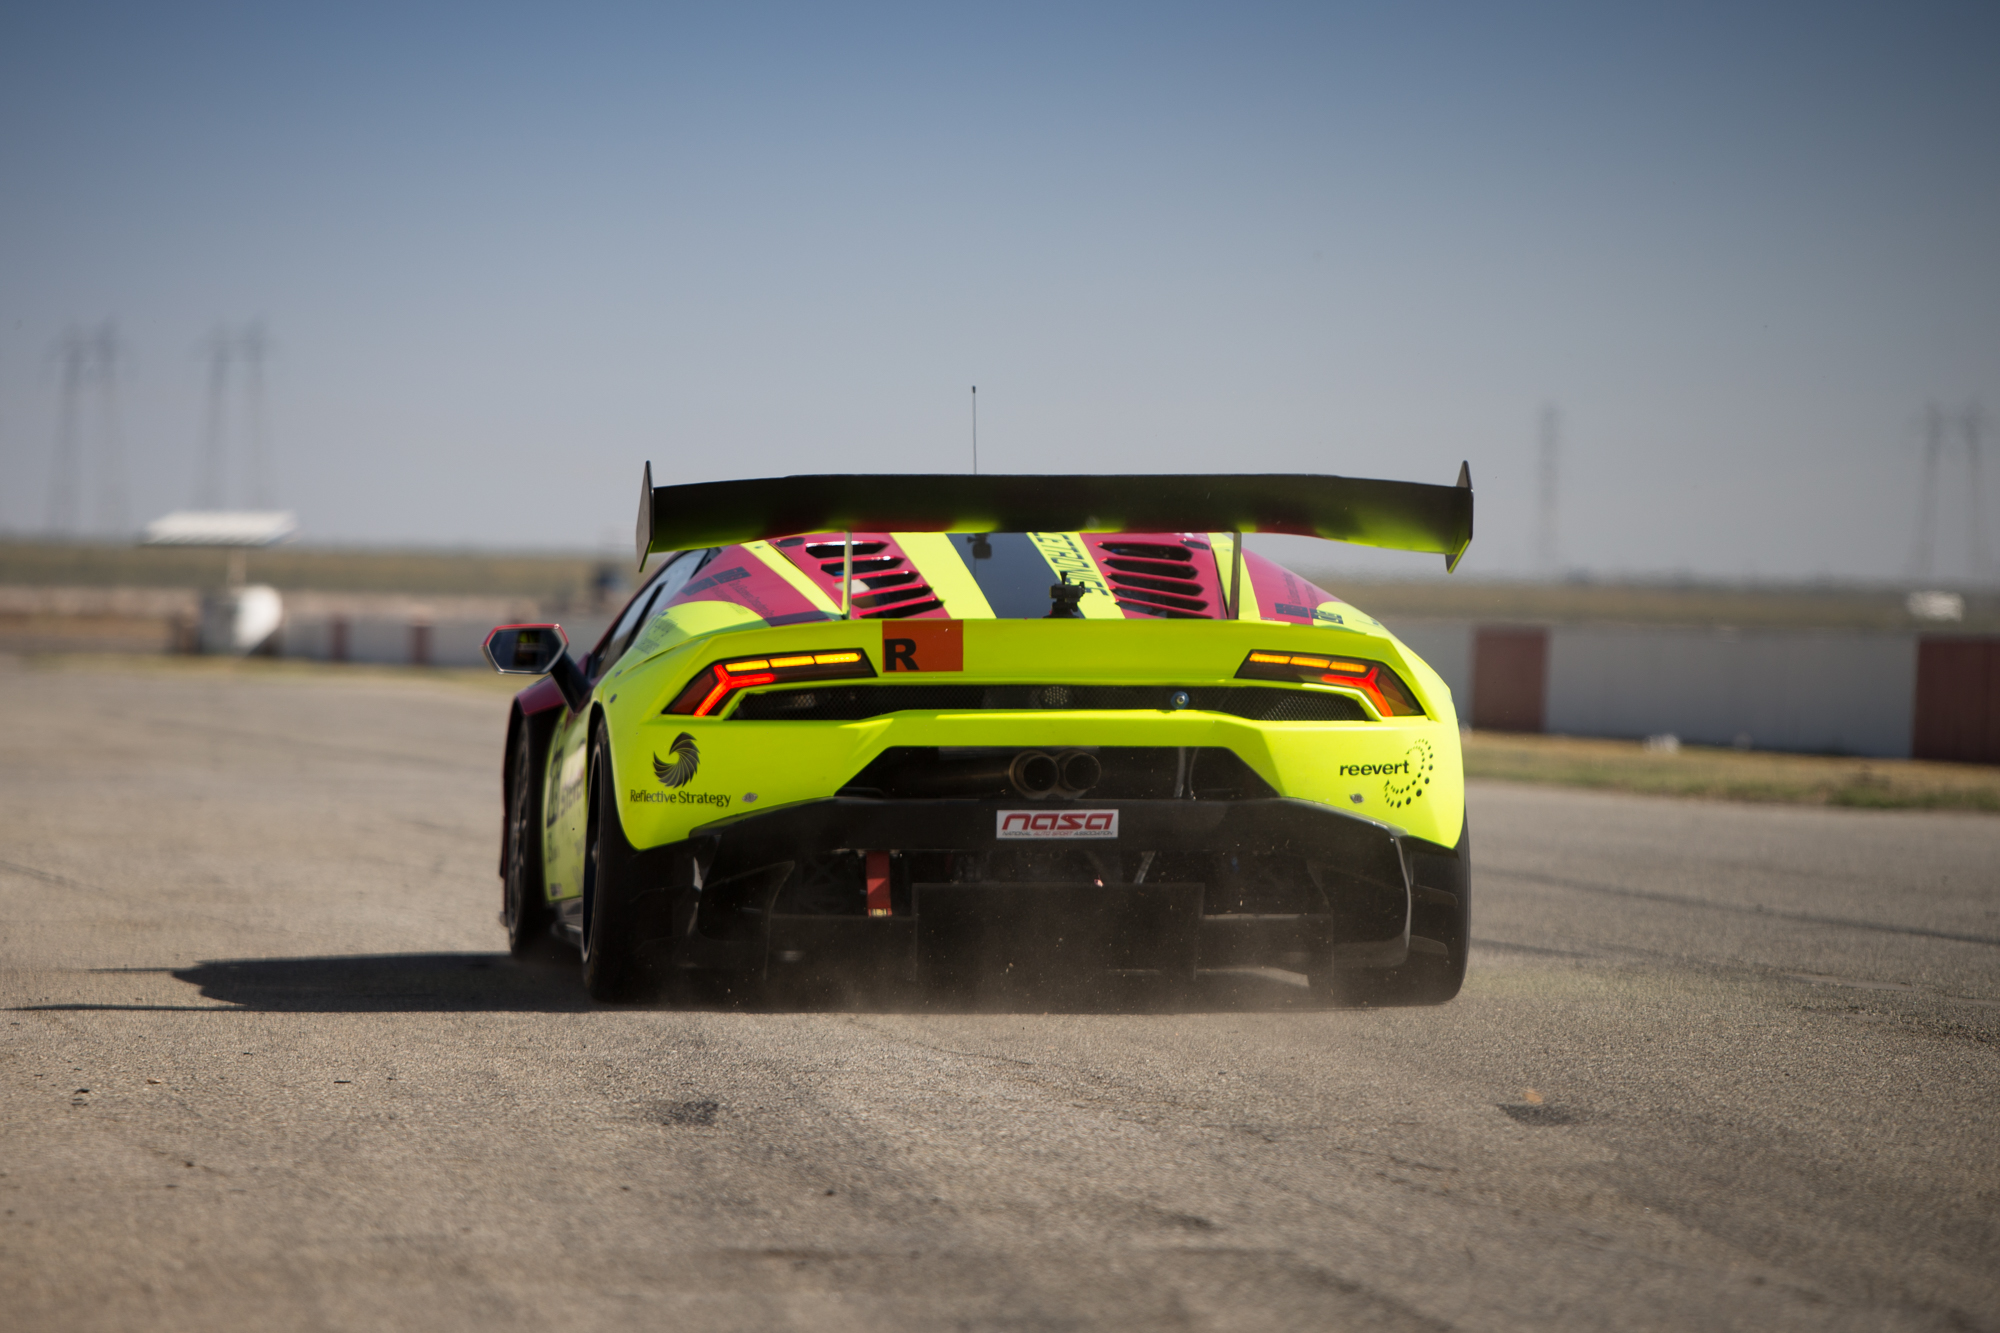 Steven-Racing-20171027-53666.jpg